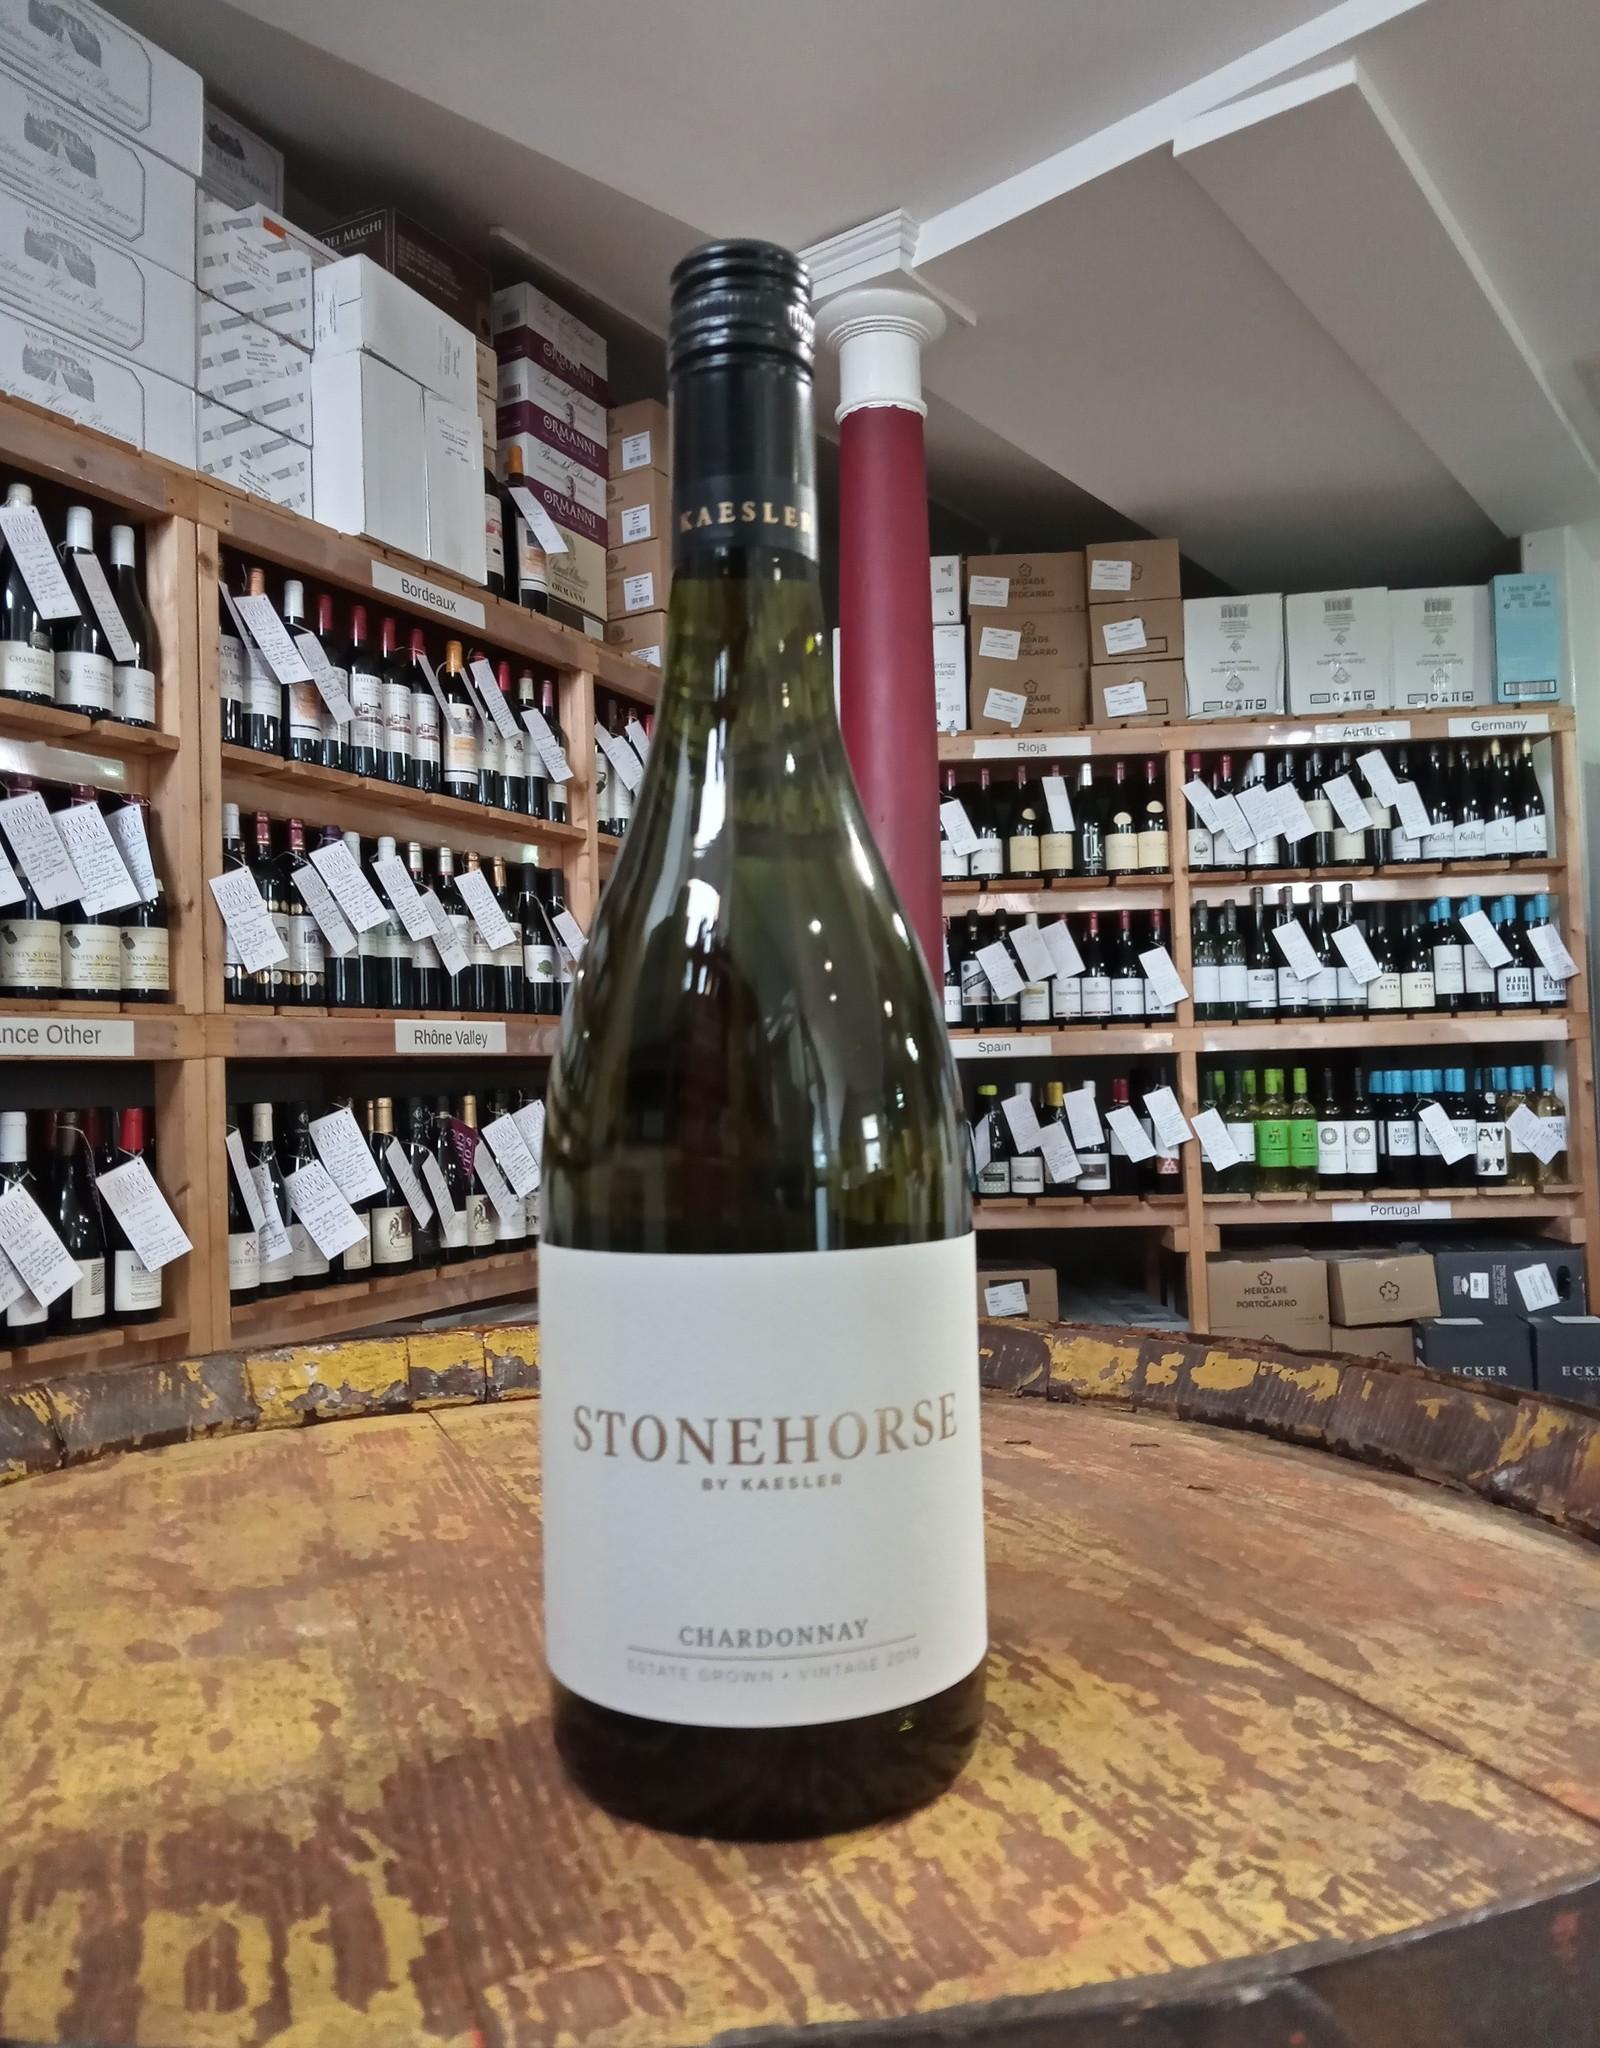 2019 Kaesler Stonehorse Chardonnay